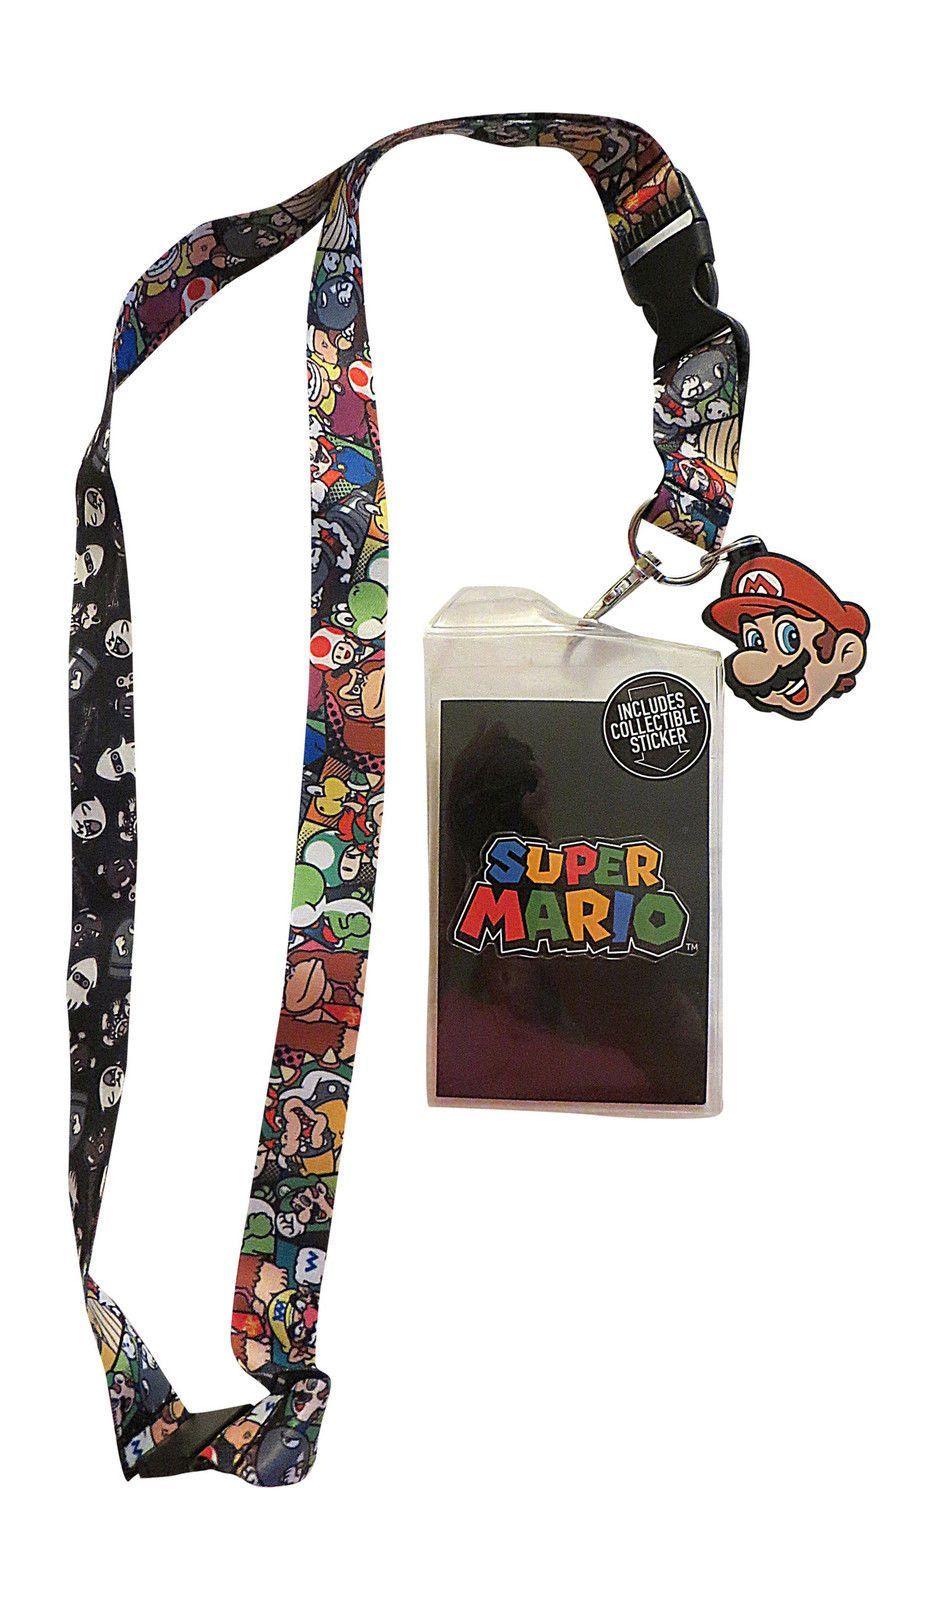 Super Mario Breakaway Lanyard With Charm - ID Badge / Ticket Holder New